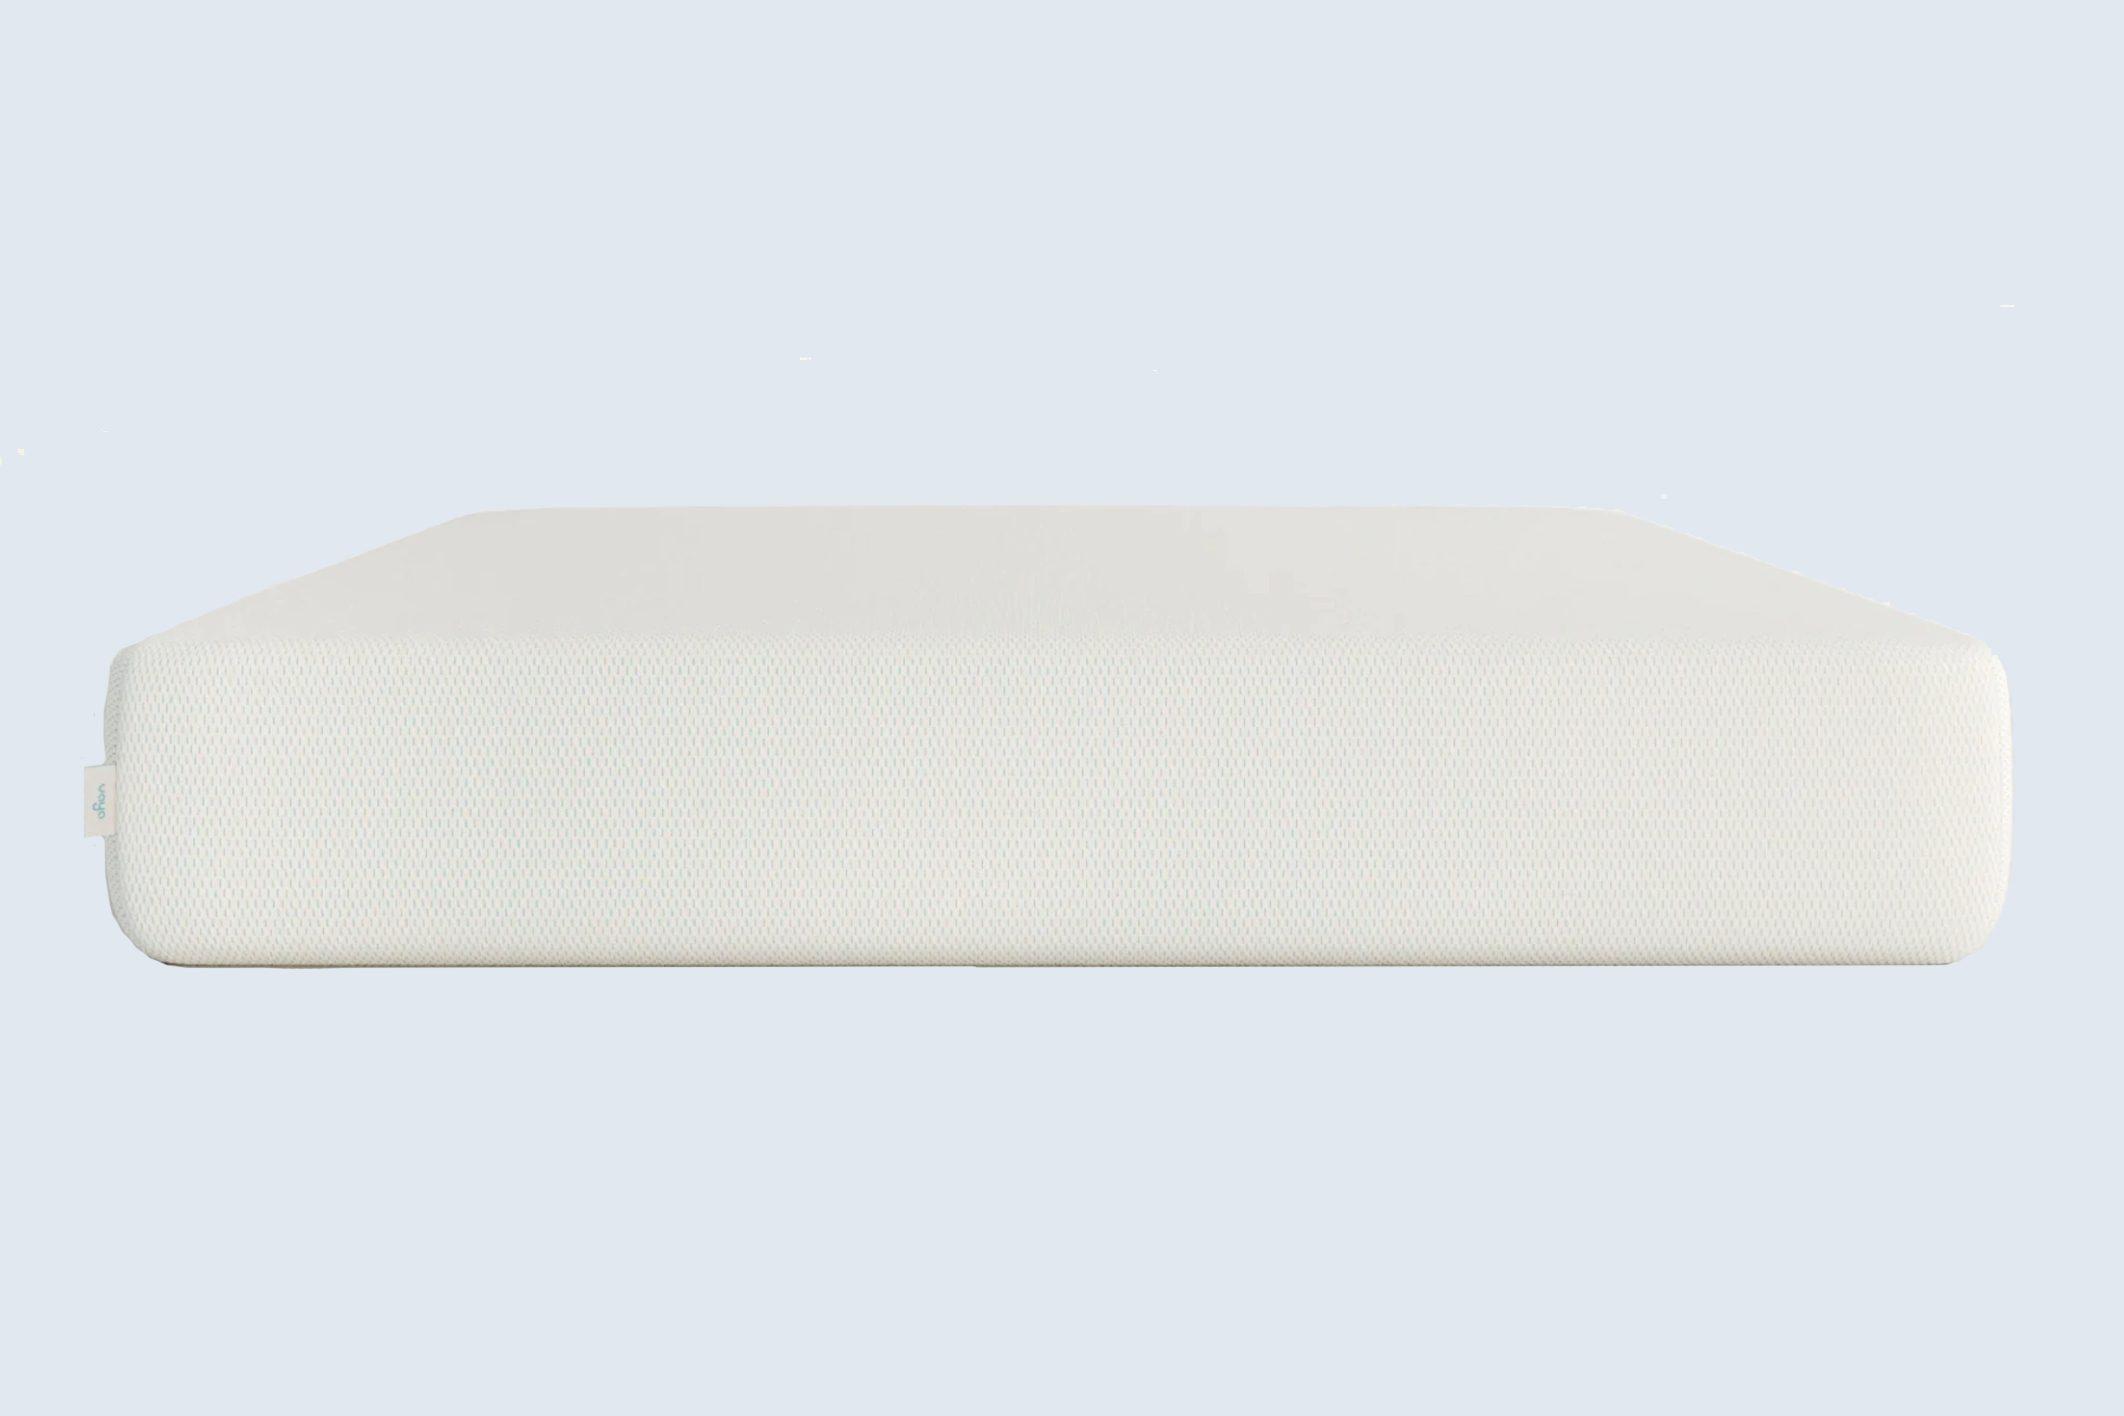 Vaya: $300 off any mattress